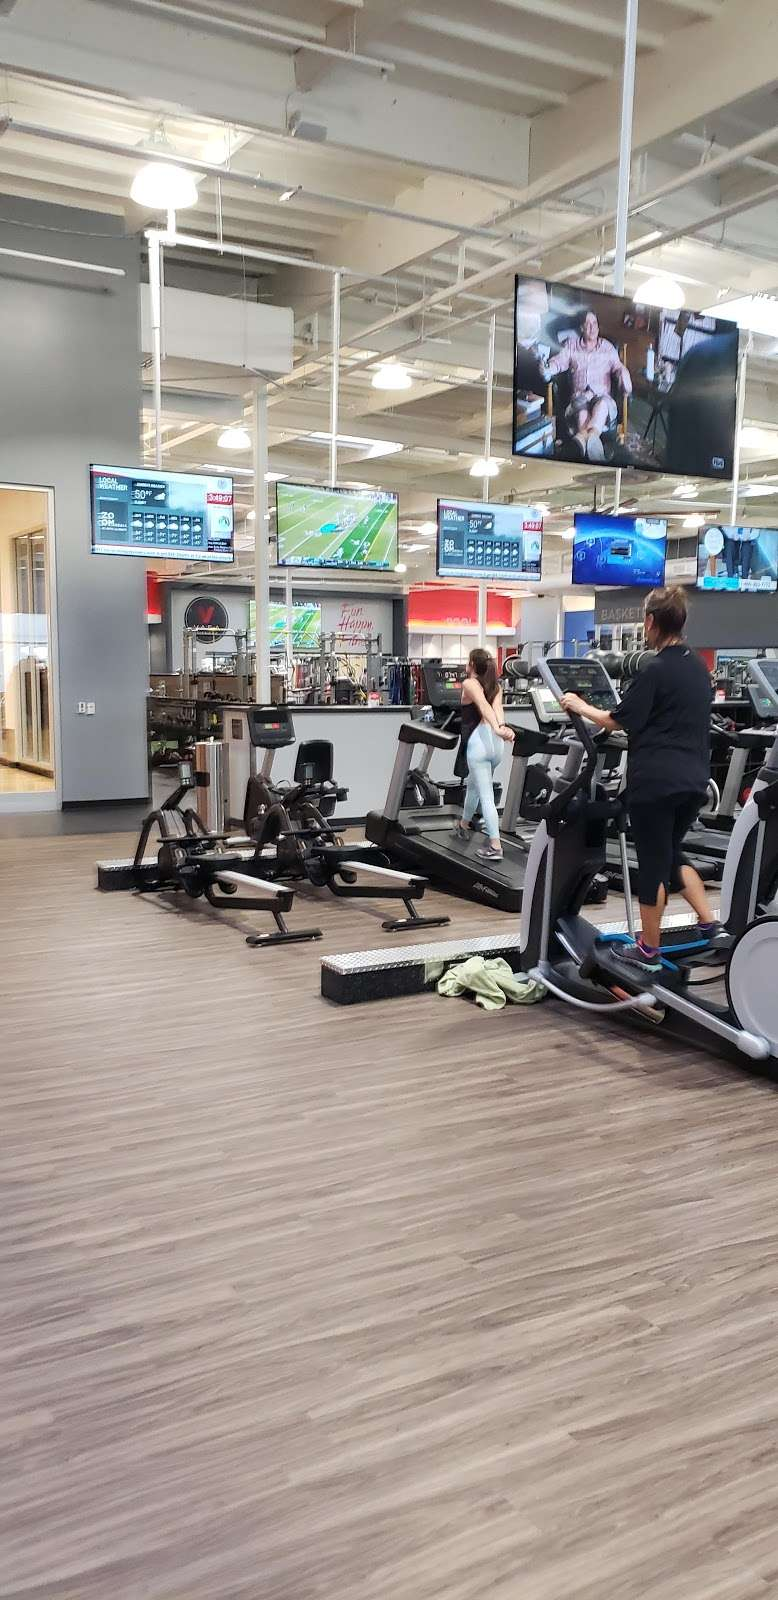 VASA Fitness - gym    Photo 3 of 9   Address: 4255 W Thunderbird Rd, Phoenix, AZ 85053, USA   Phone: (602) 603-0811